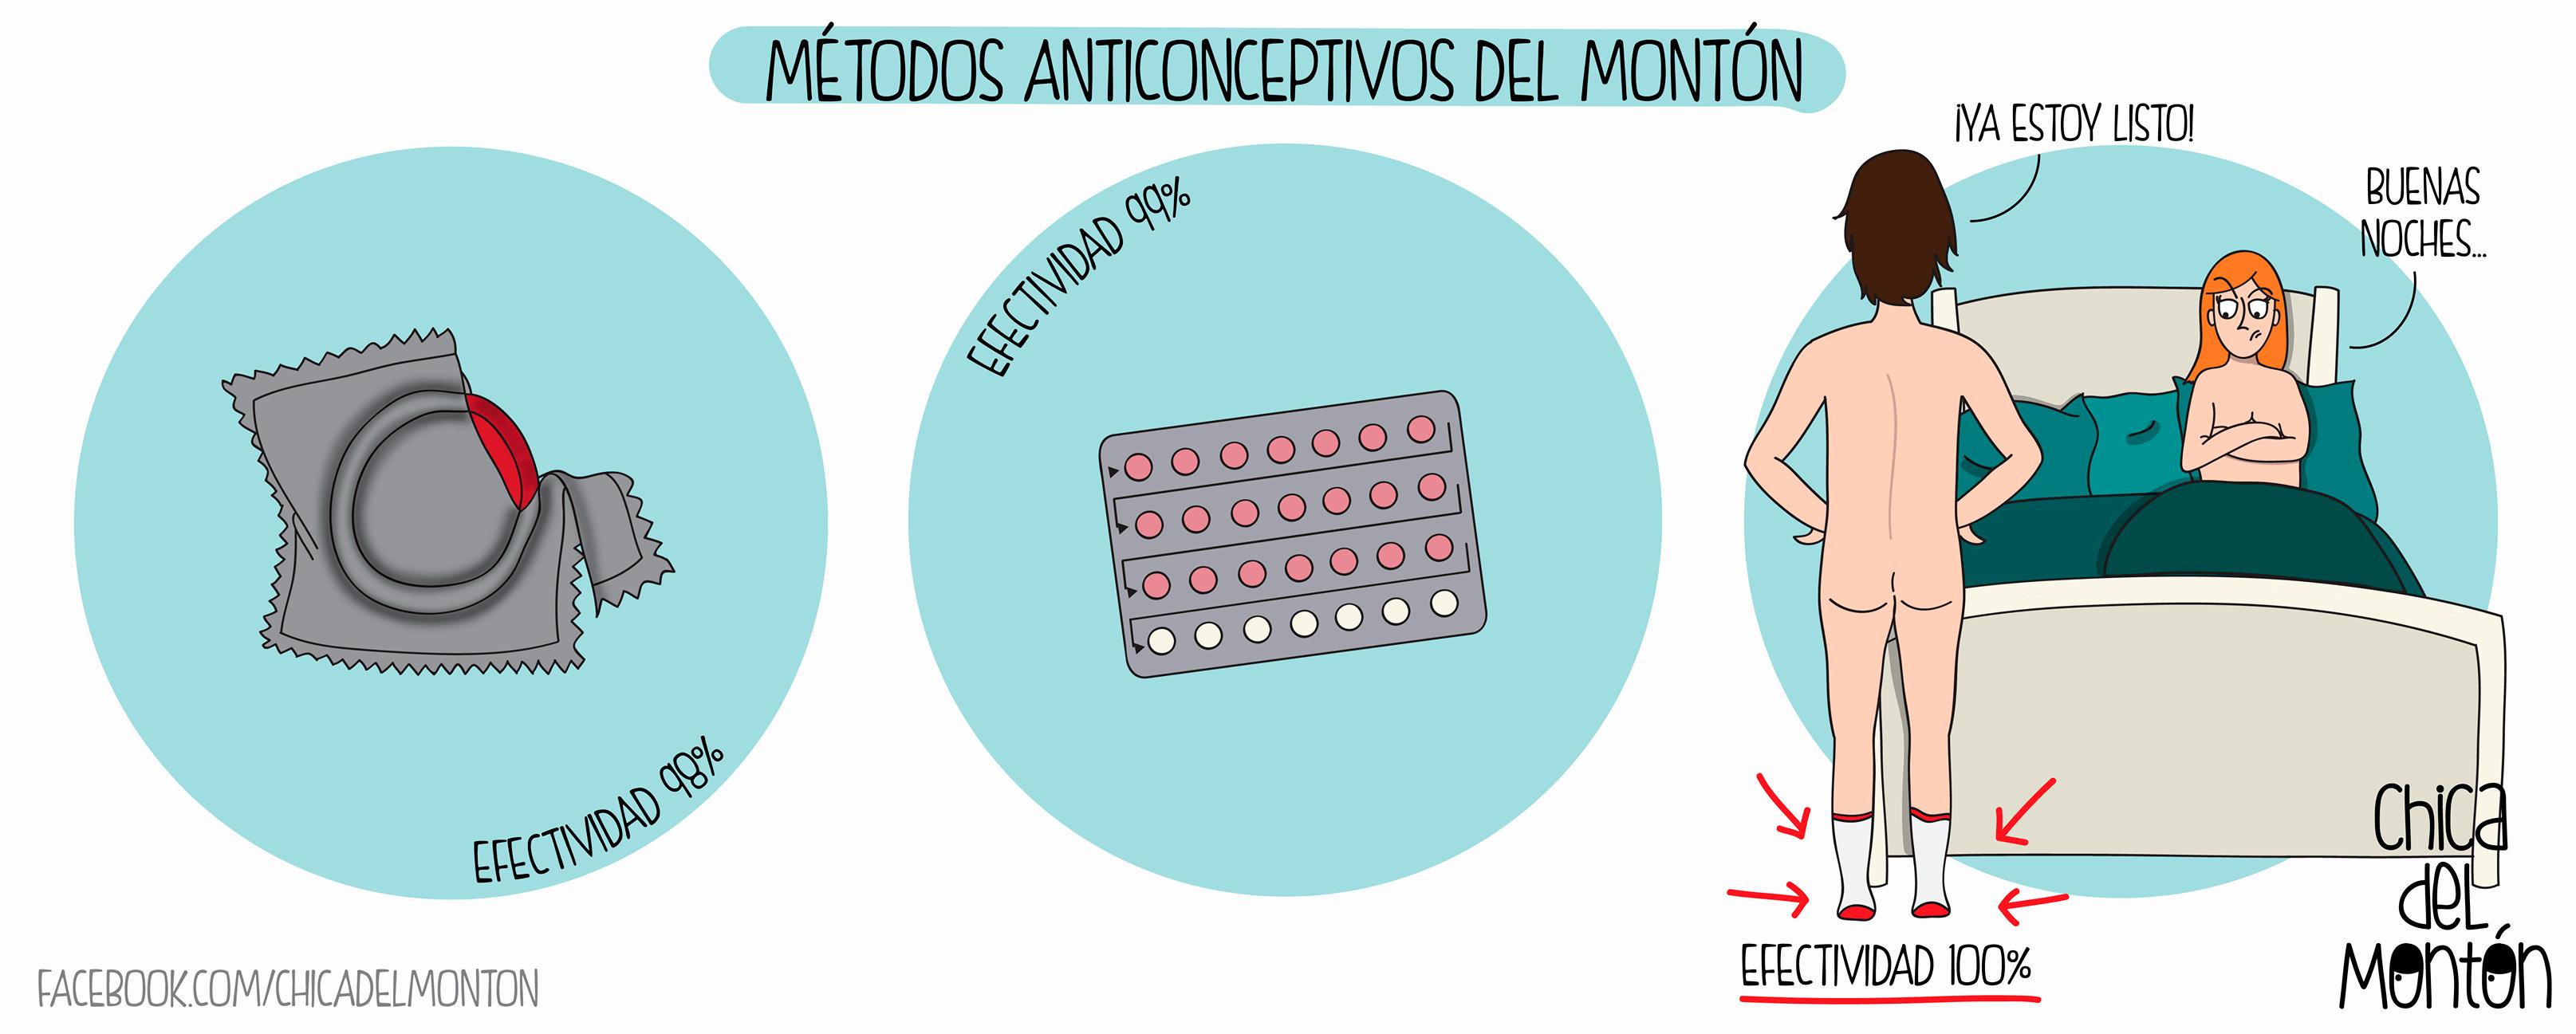 laura-mesa-chica-monton-anticonceptivos